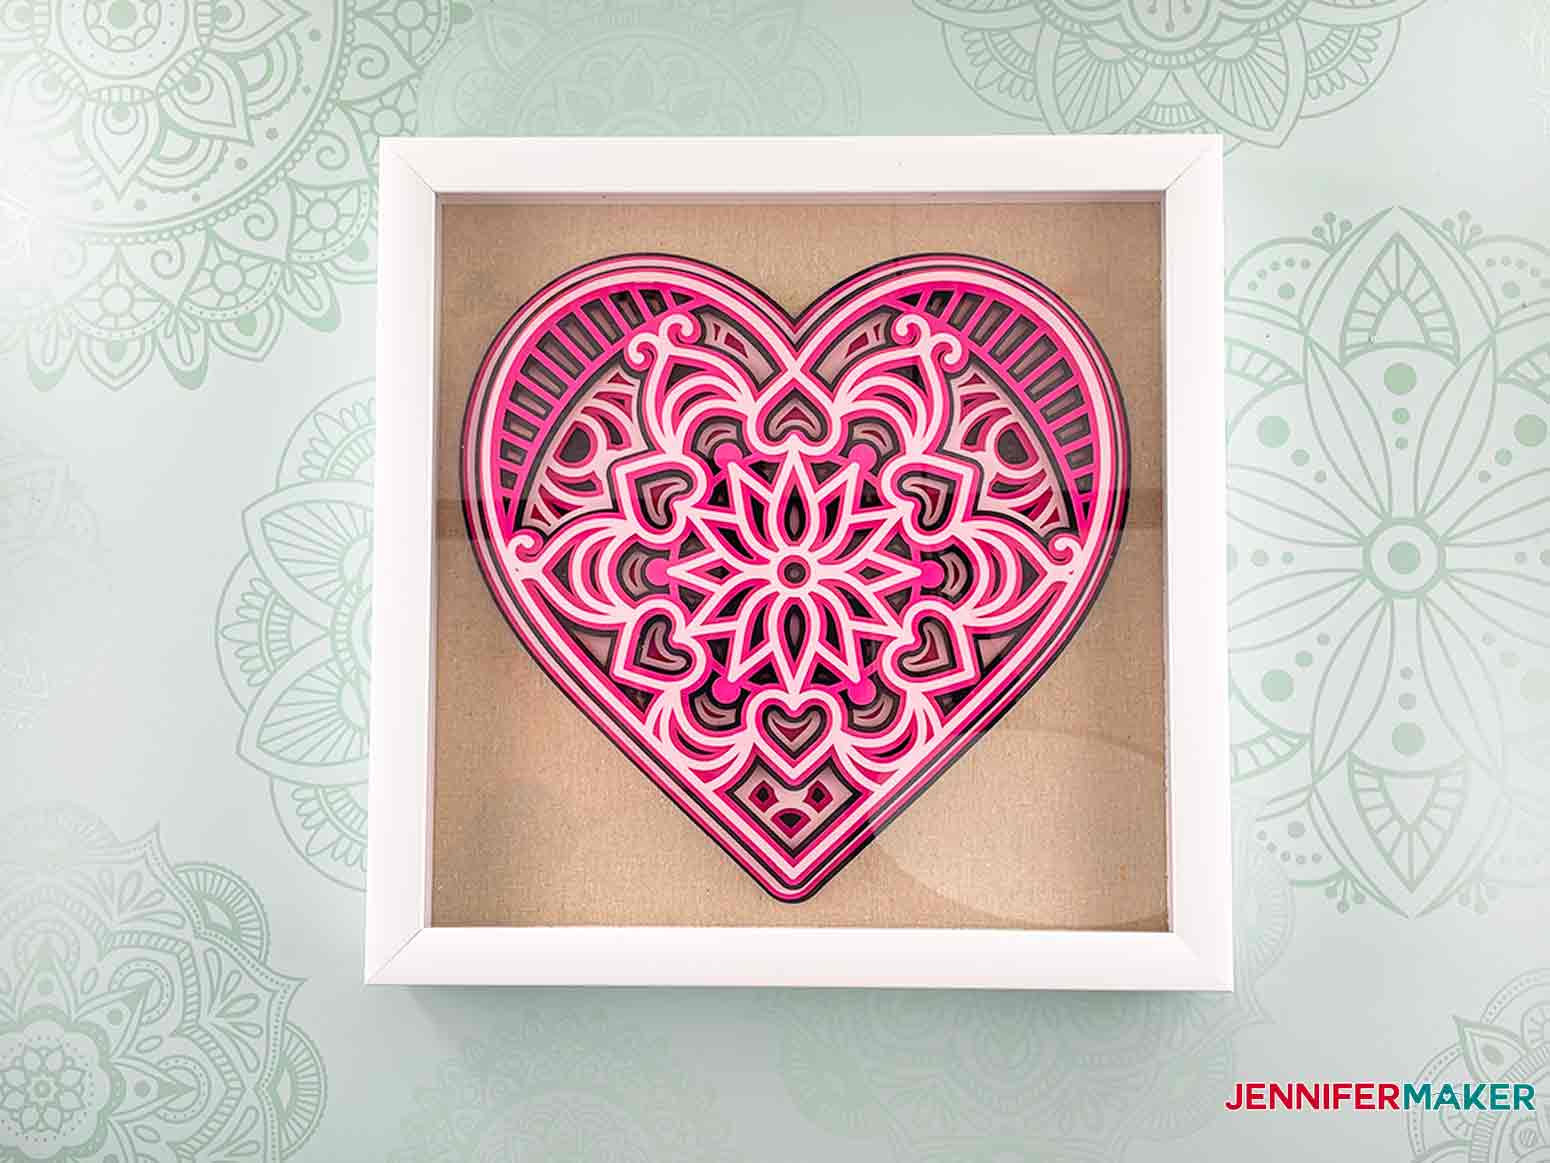 This is what my heart mandala looks like framed